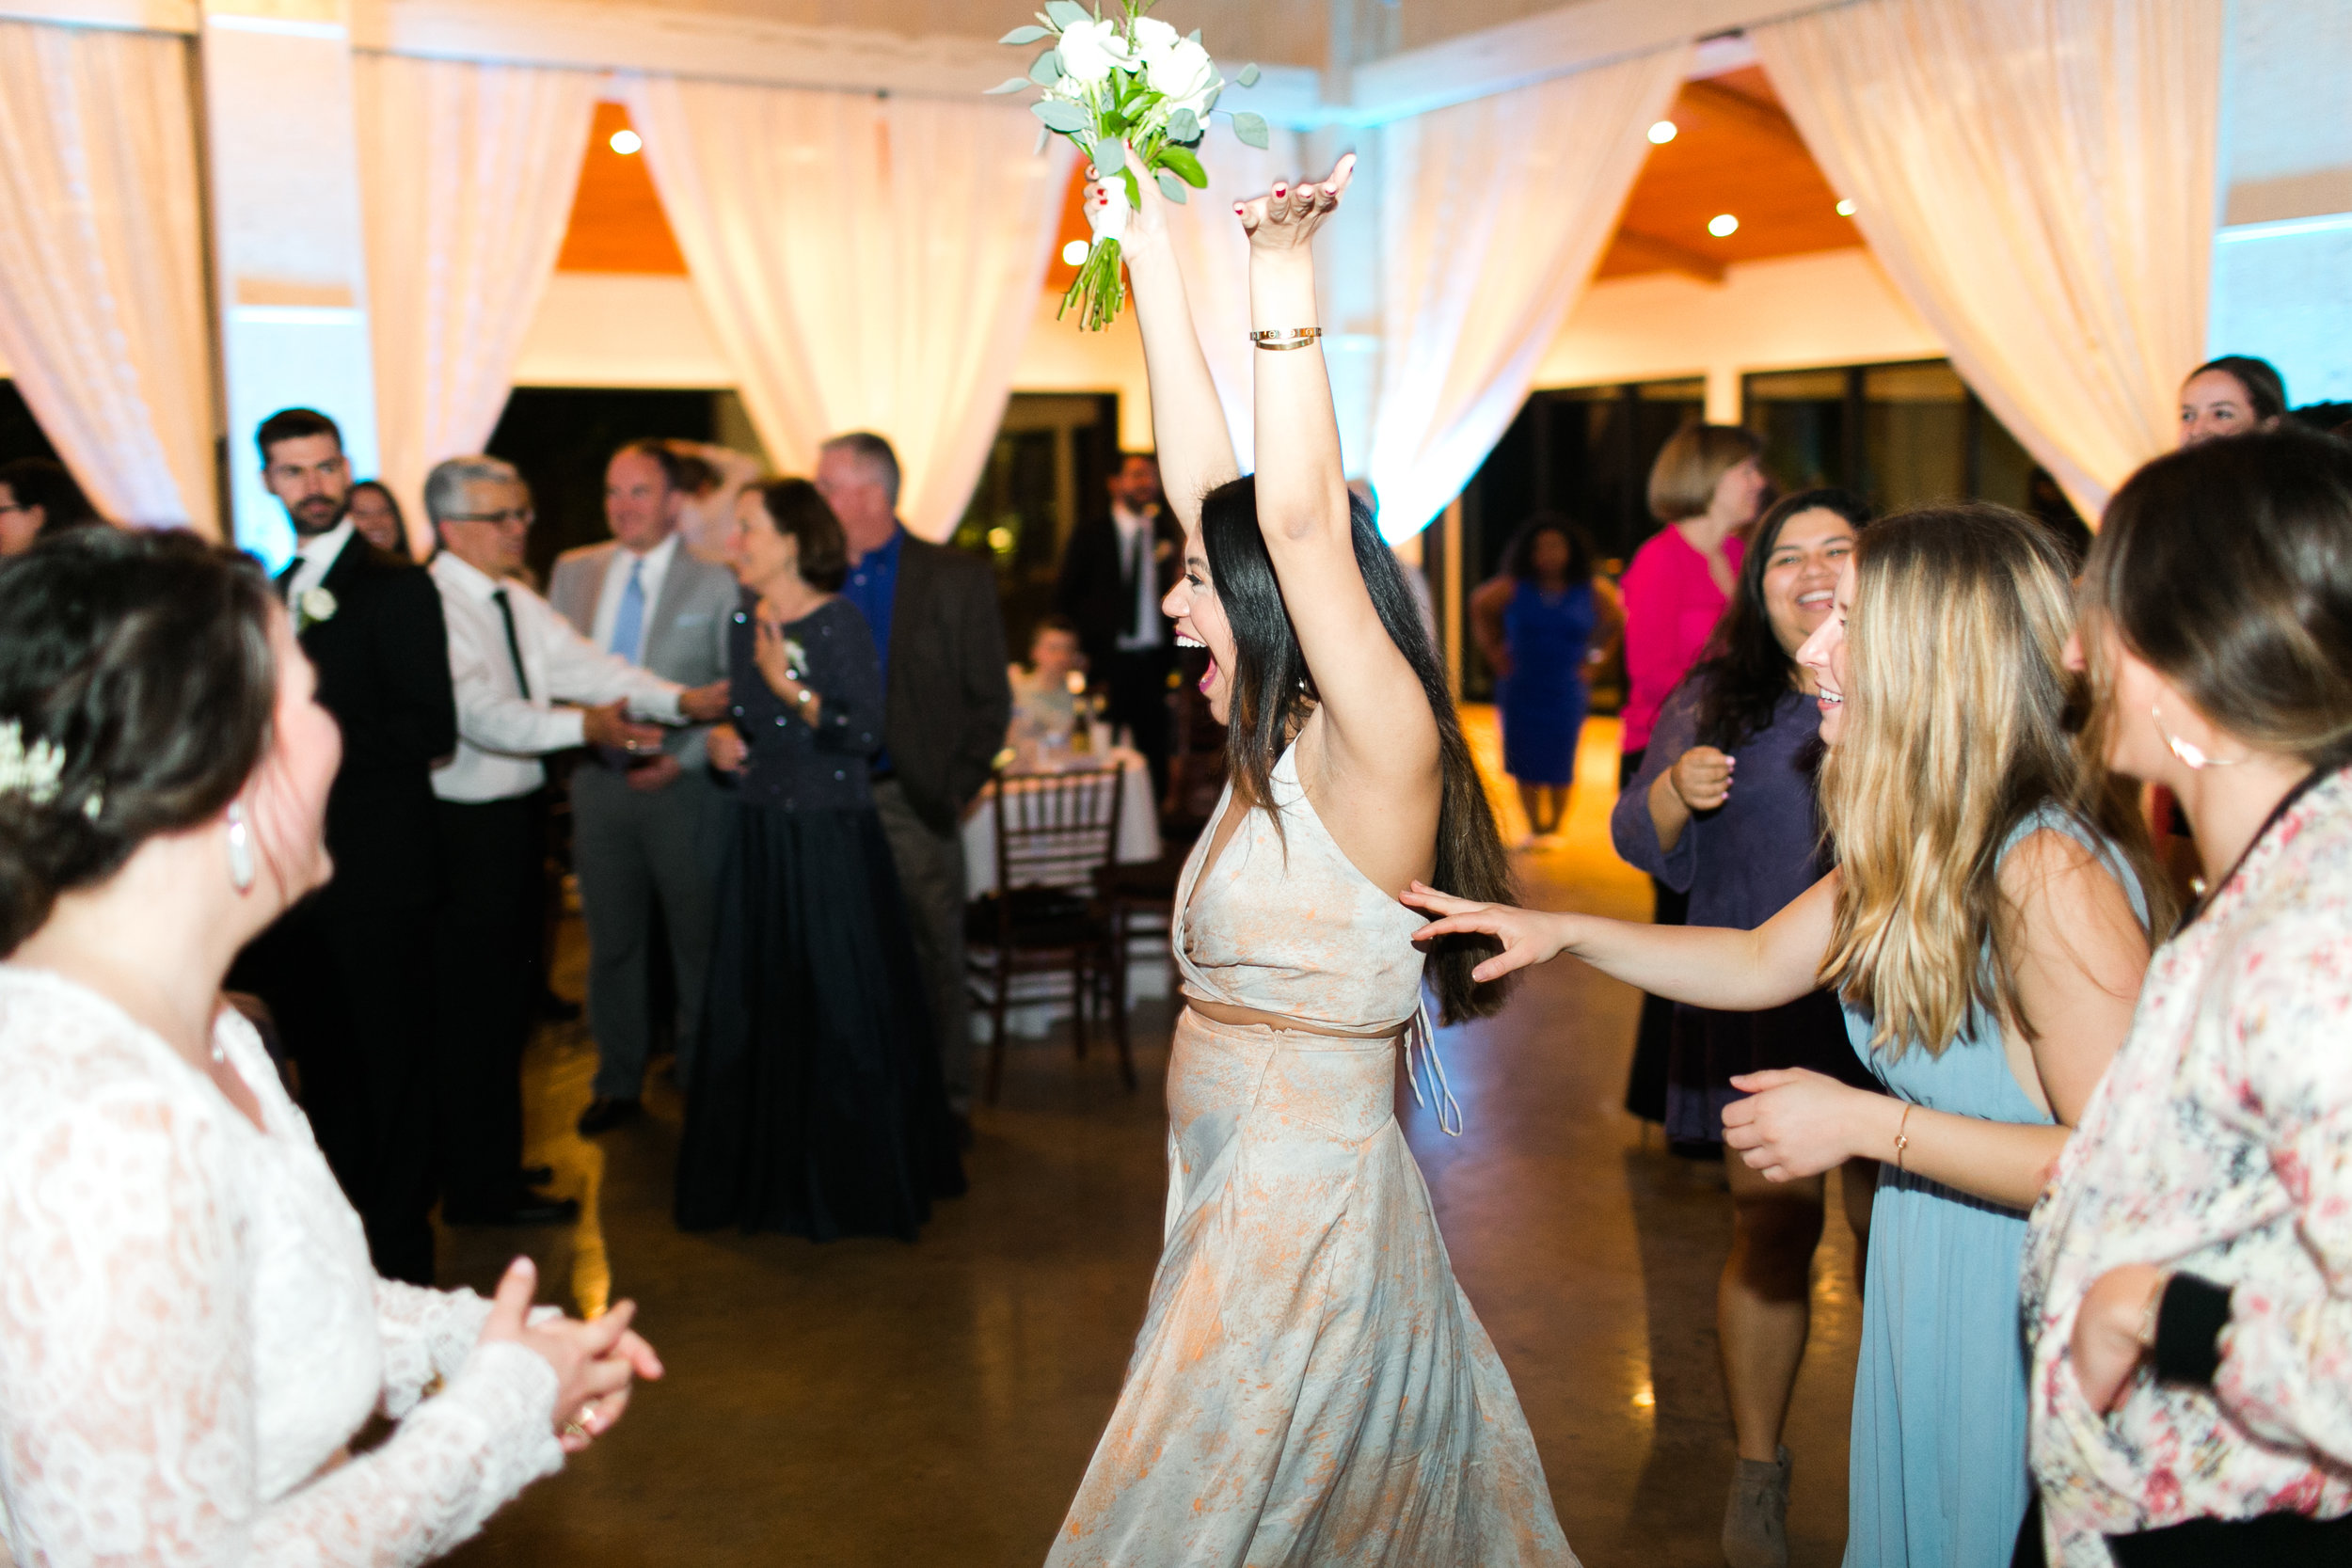 Austin_Texas_Fine_Art_Wedding_Photographer_Kayla_Snell_Photography_Antebellum_Oaks749.jpg